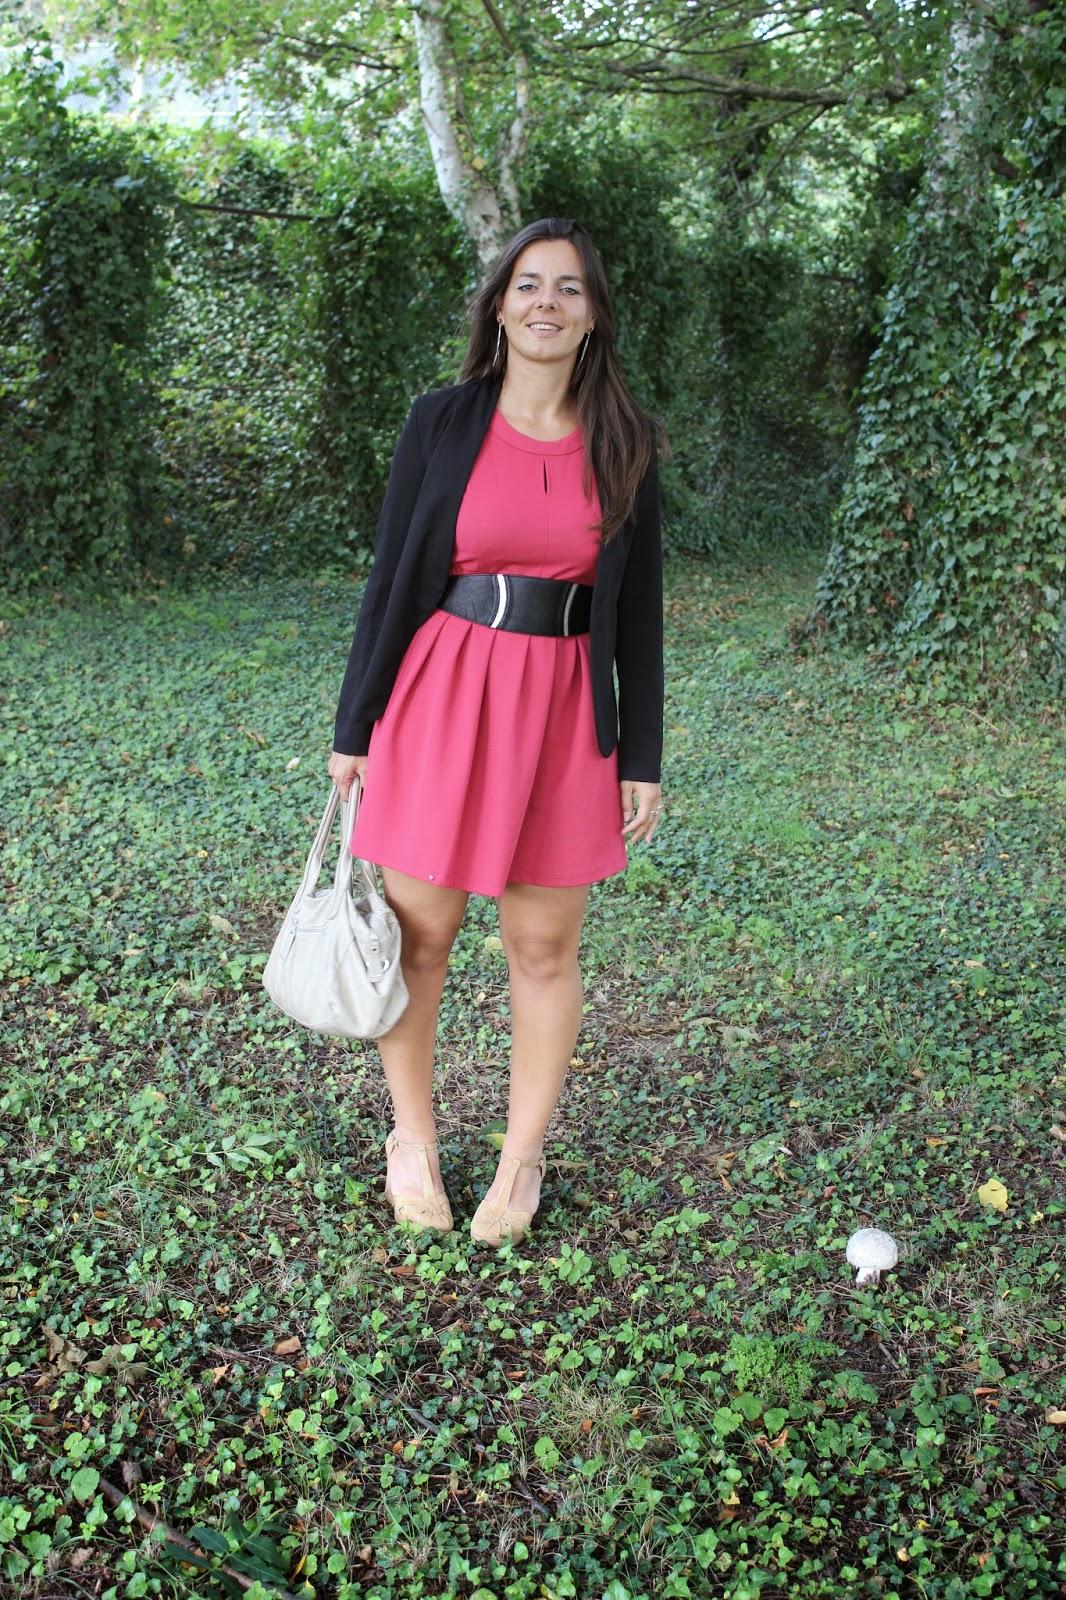 robe kling, chaussures comptoir des cotonniers, veste persunmall